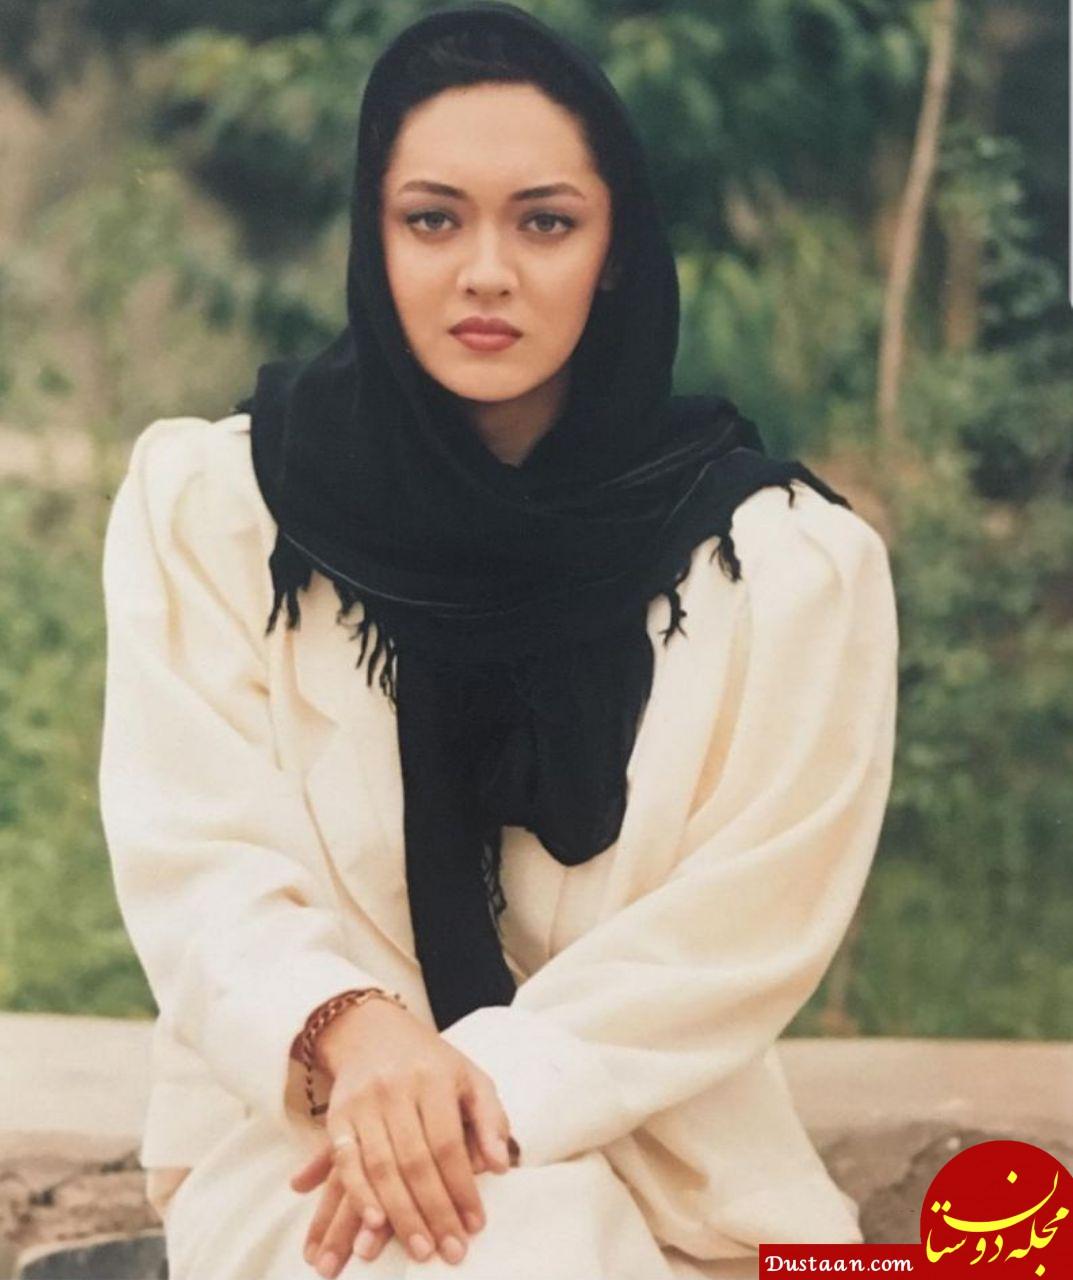 www.dustaan.com بیوگرافی و عکس های دیدنی نیکی کریمی